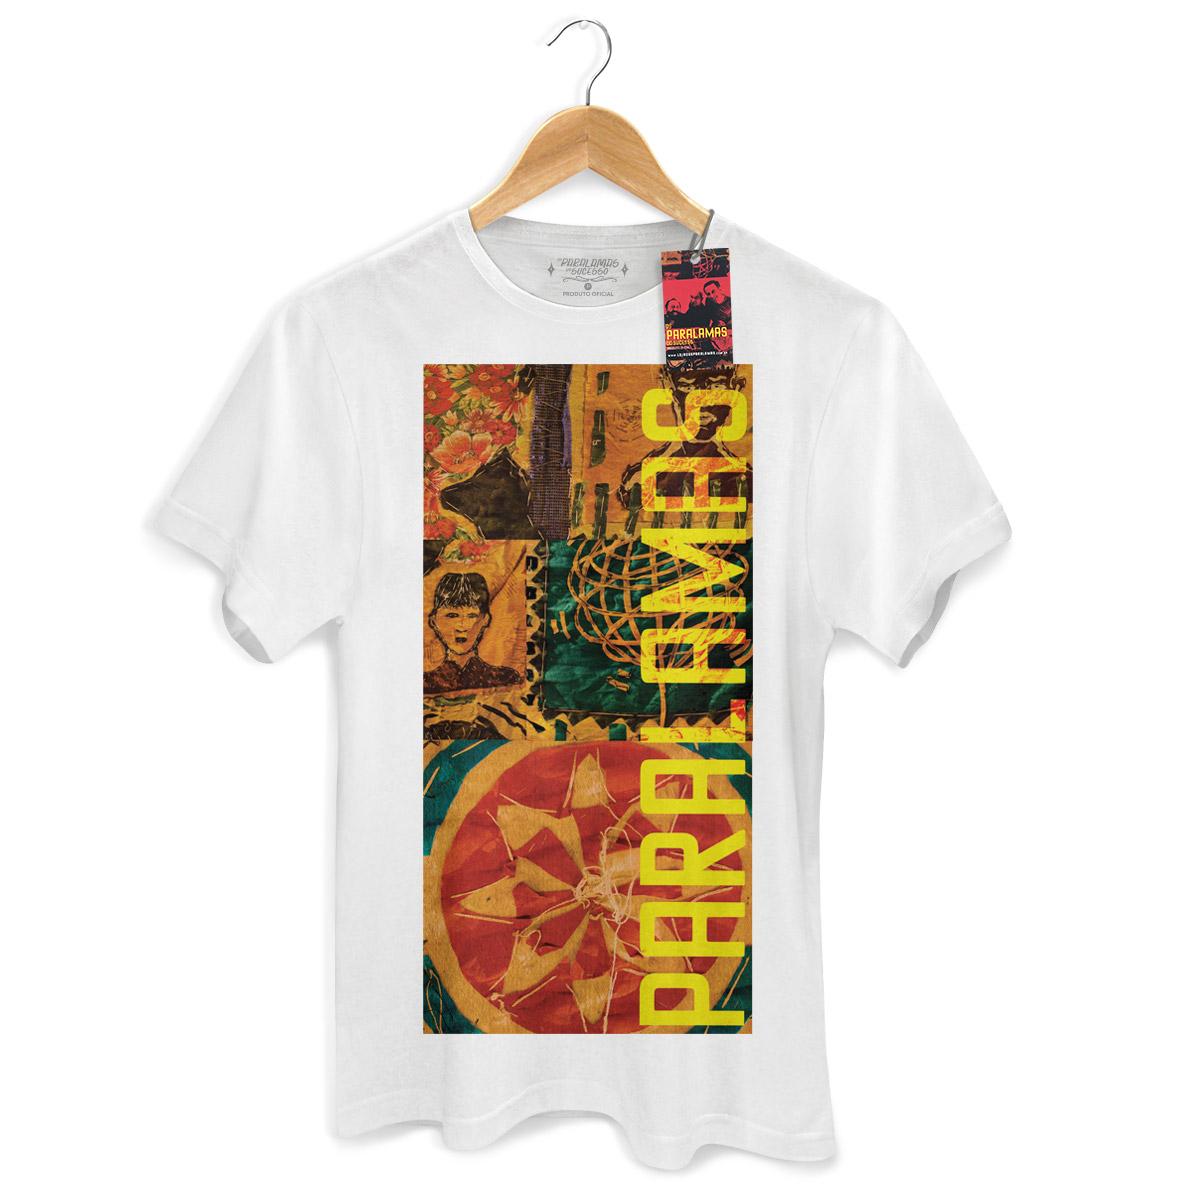 Camiseta Masculina Os Paralamas Do Sucesso - Brasil Afora  - bandUP Store Marketplace